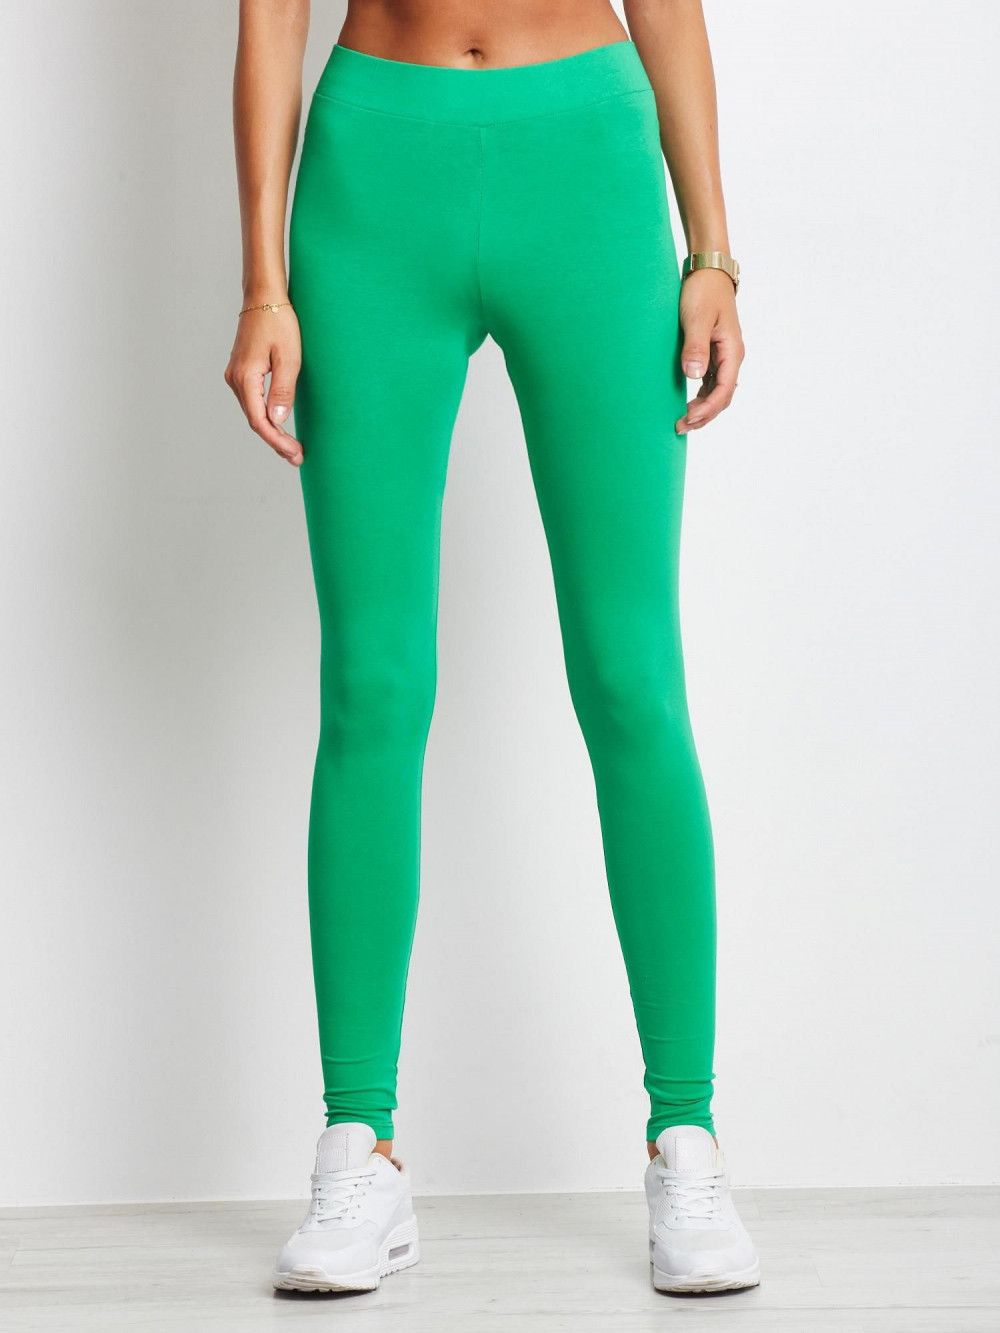 Zielone legginsy fitness Prime 2